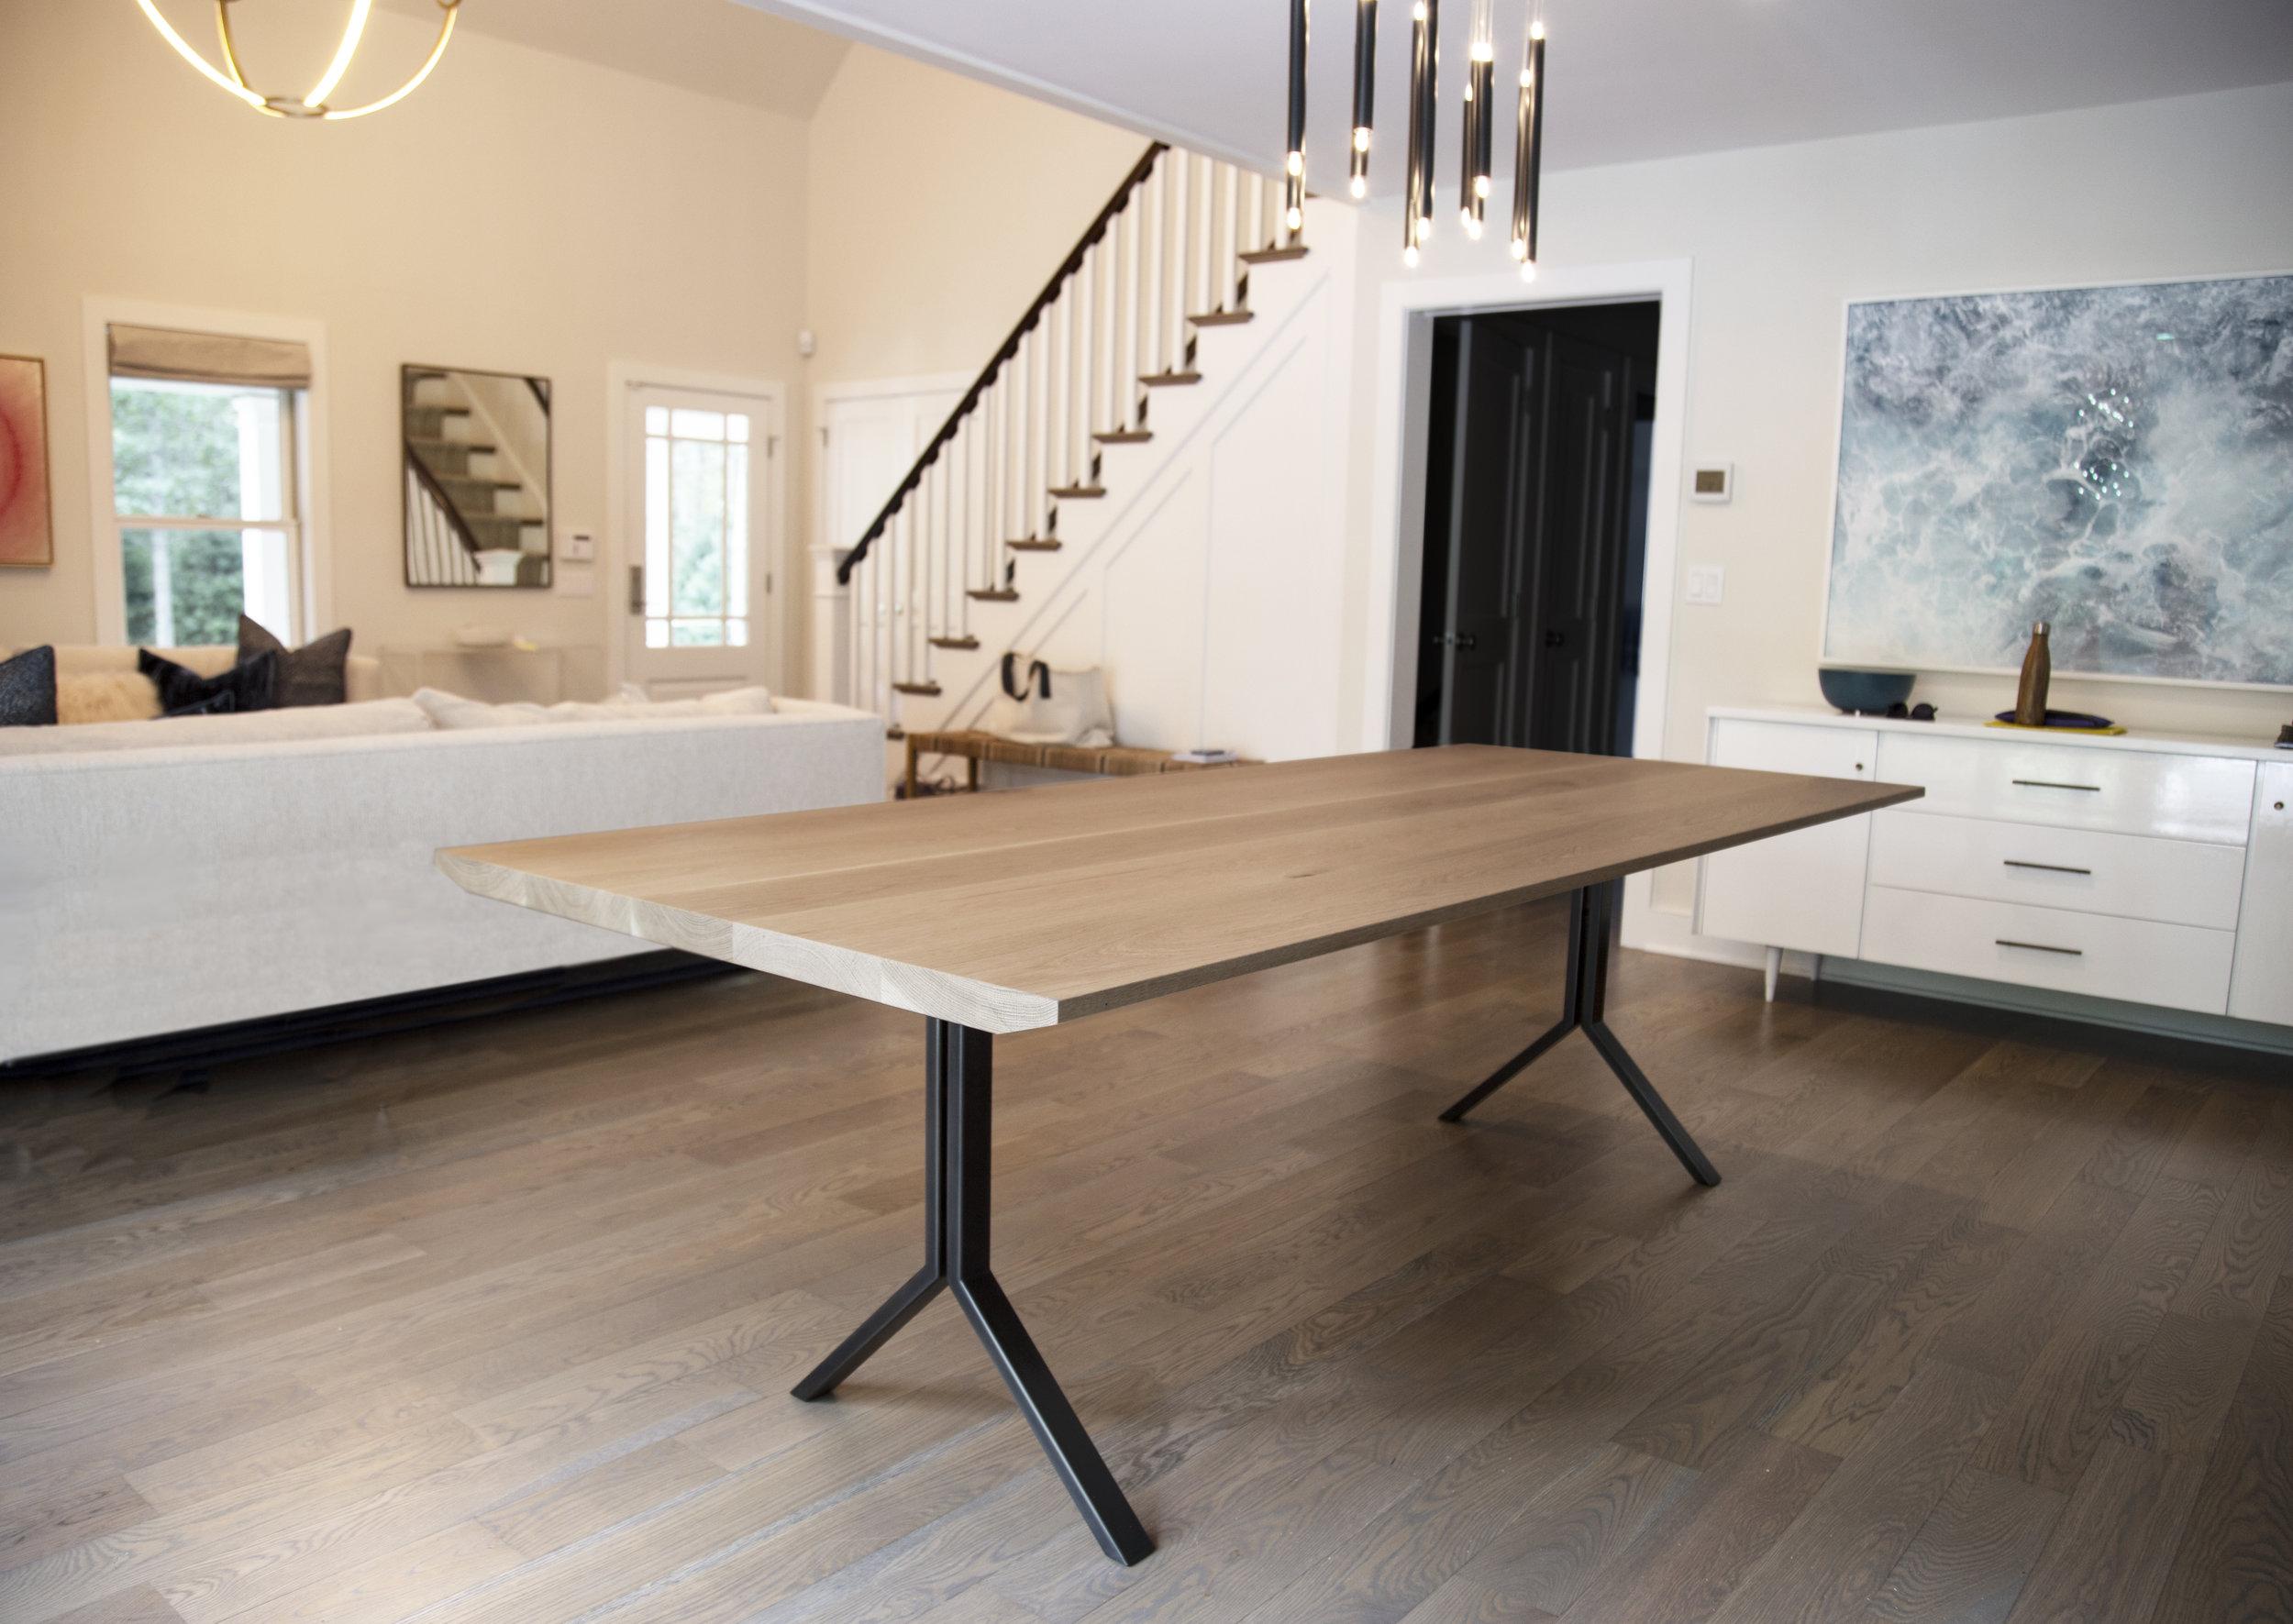 Huntington_Oak_Dining_Table_1.jpg